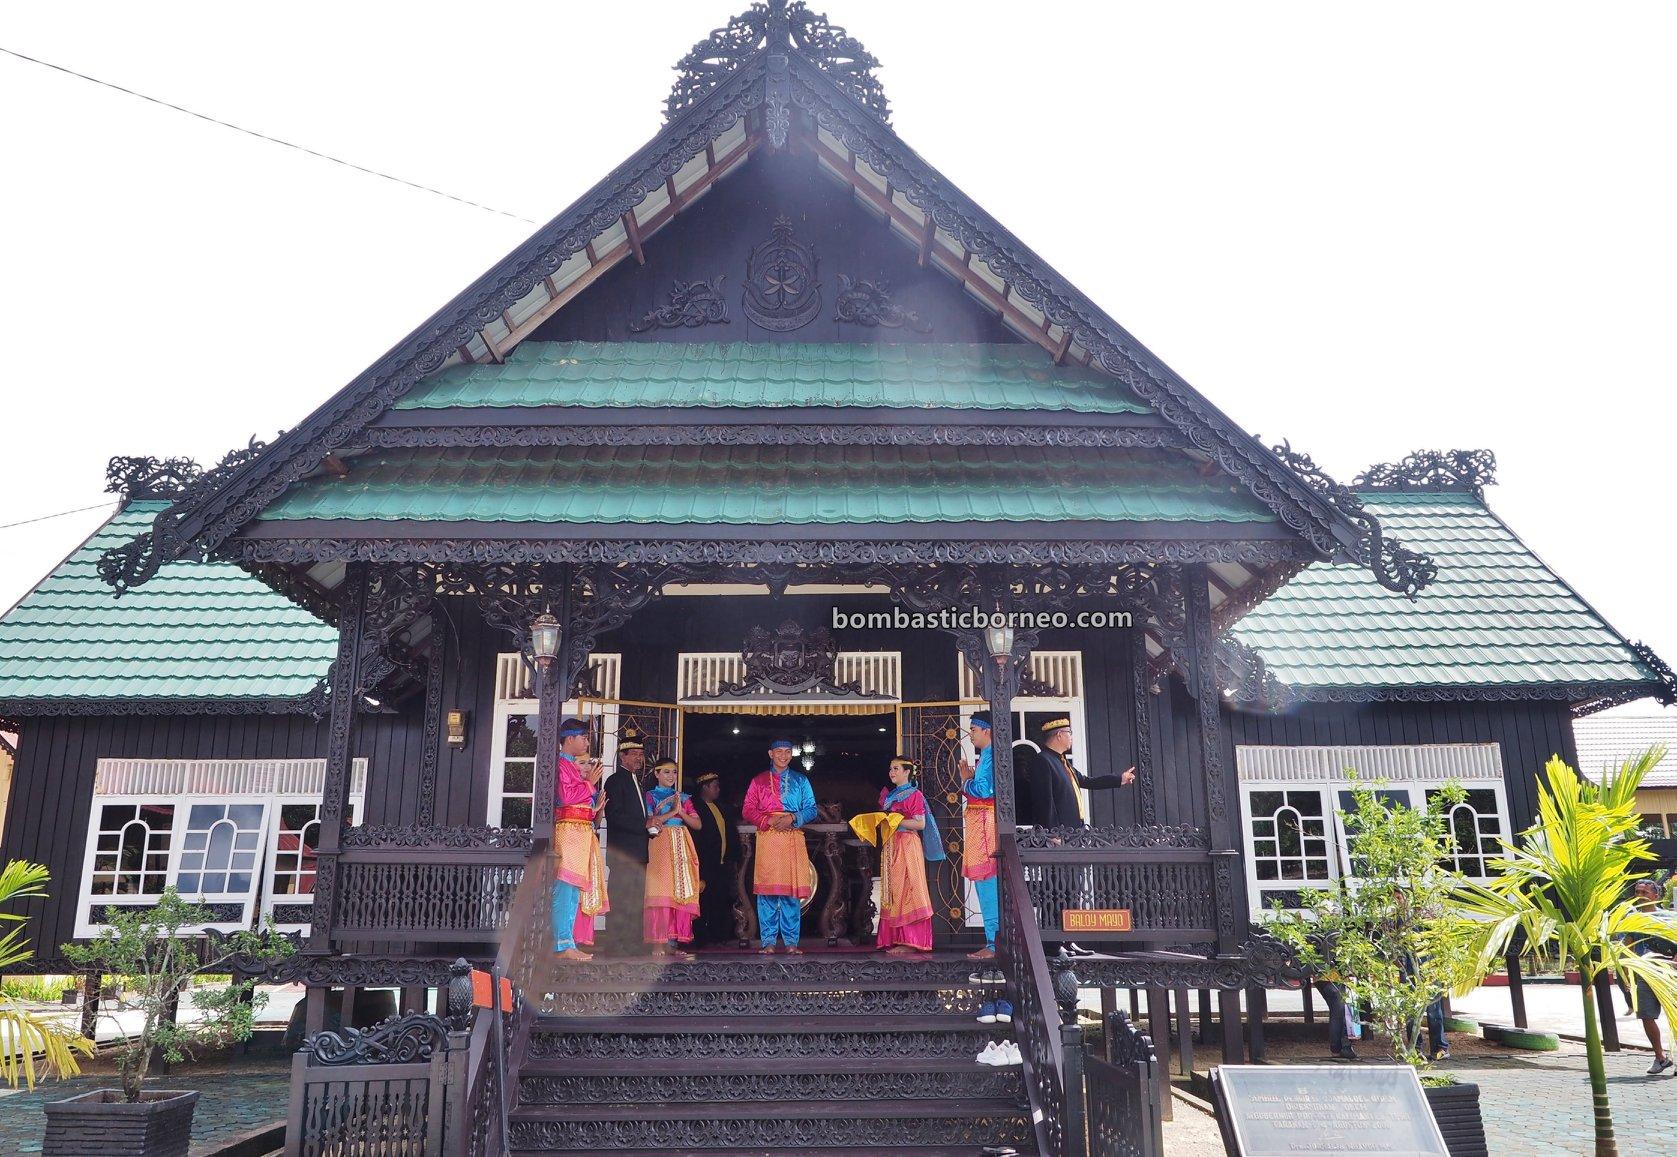 Cultural Centre, museum, authentic, traditional, native, tribal, Indonesia, Kalimantan Utara, Pariwisata, Tourist attraction, travel guide, Trans Borneo, 印尼北加里曼丹, 打拉根岛旅游景点, 原住民达雅文化